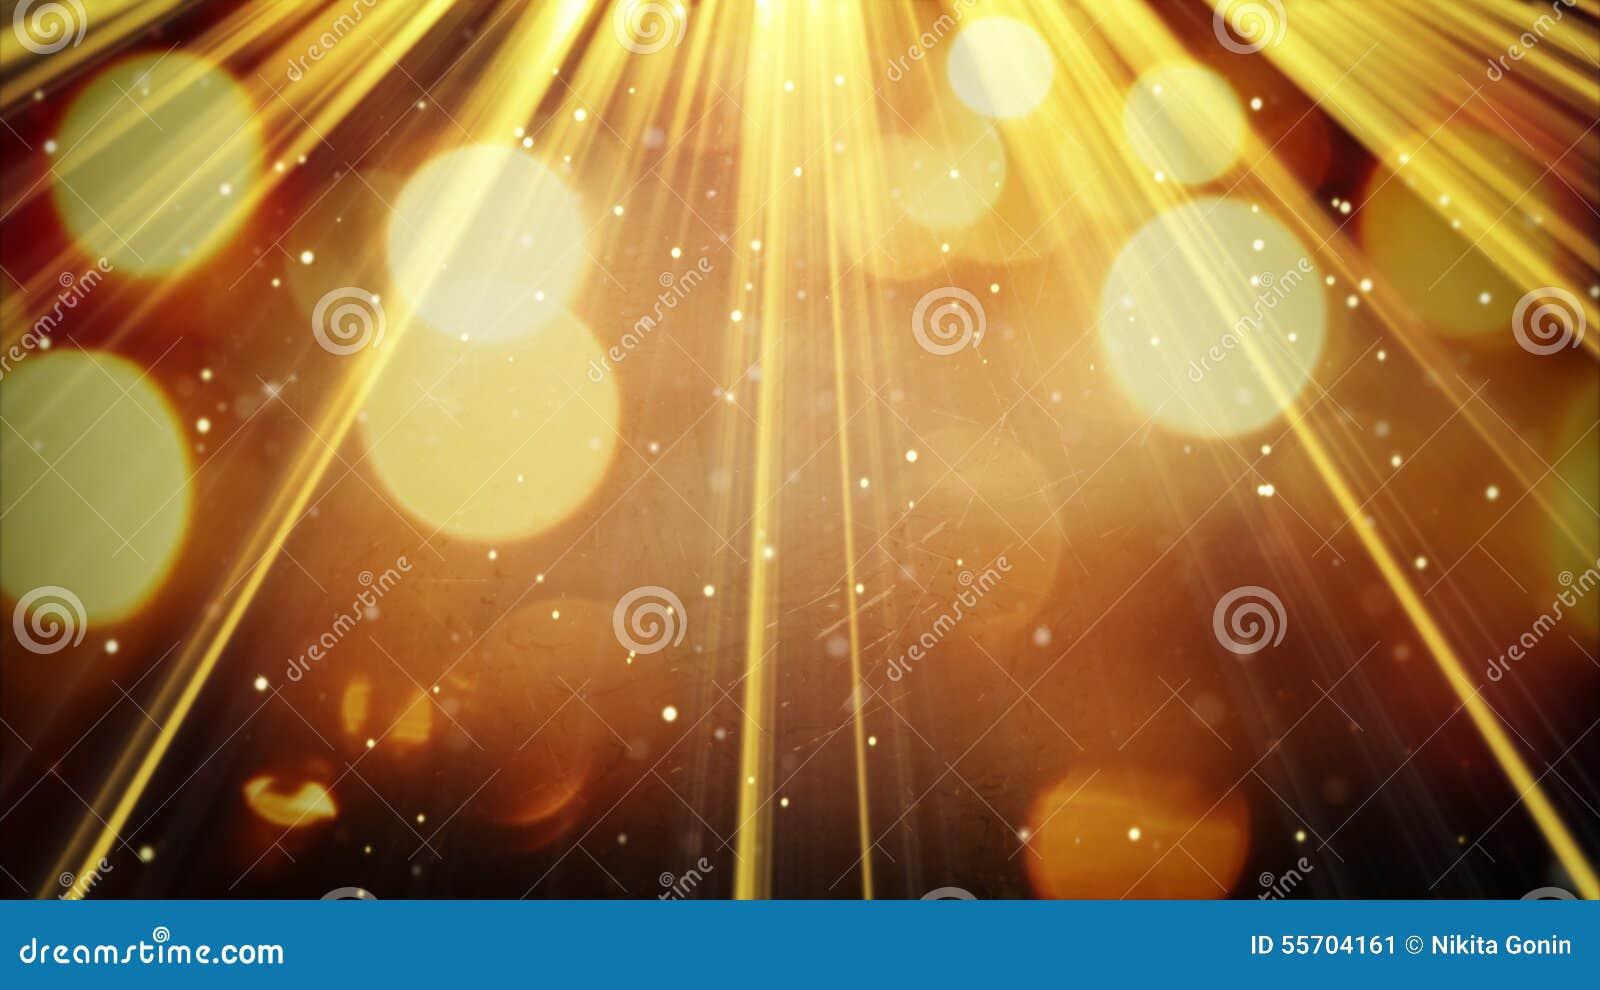 Thank You Glitter Gifs  PicGifscom